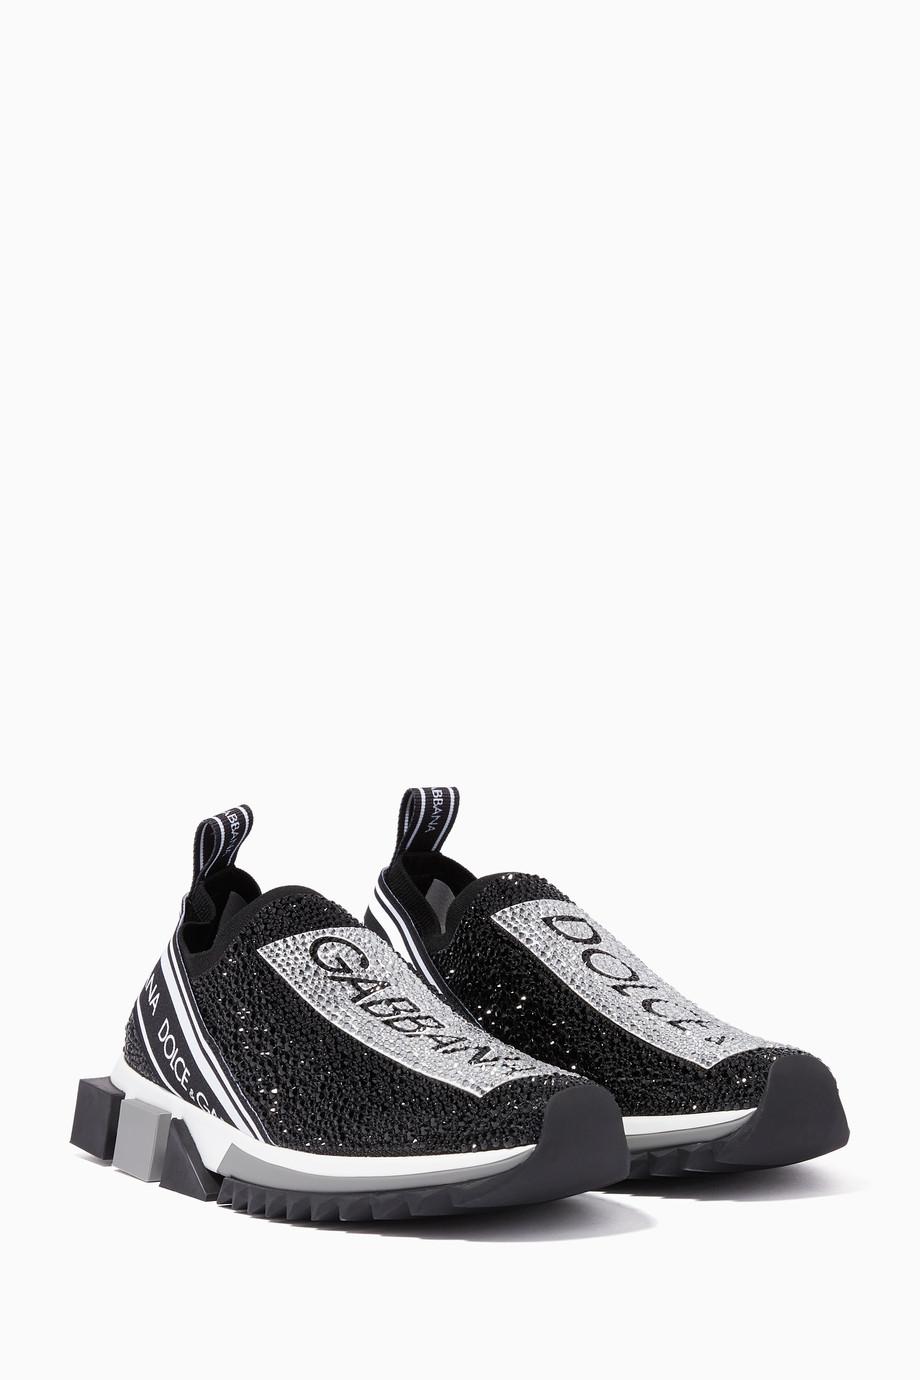 c673d93a0 Shop Dolce & Gabbana Black White & Black Sorrento Crystal ...